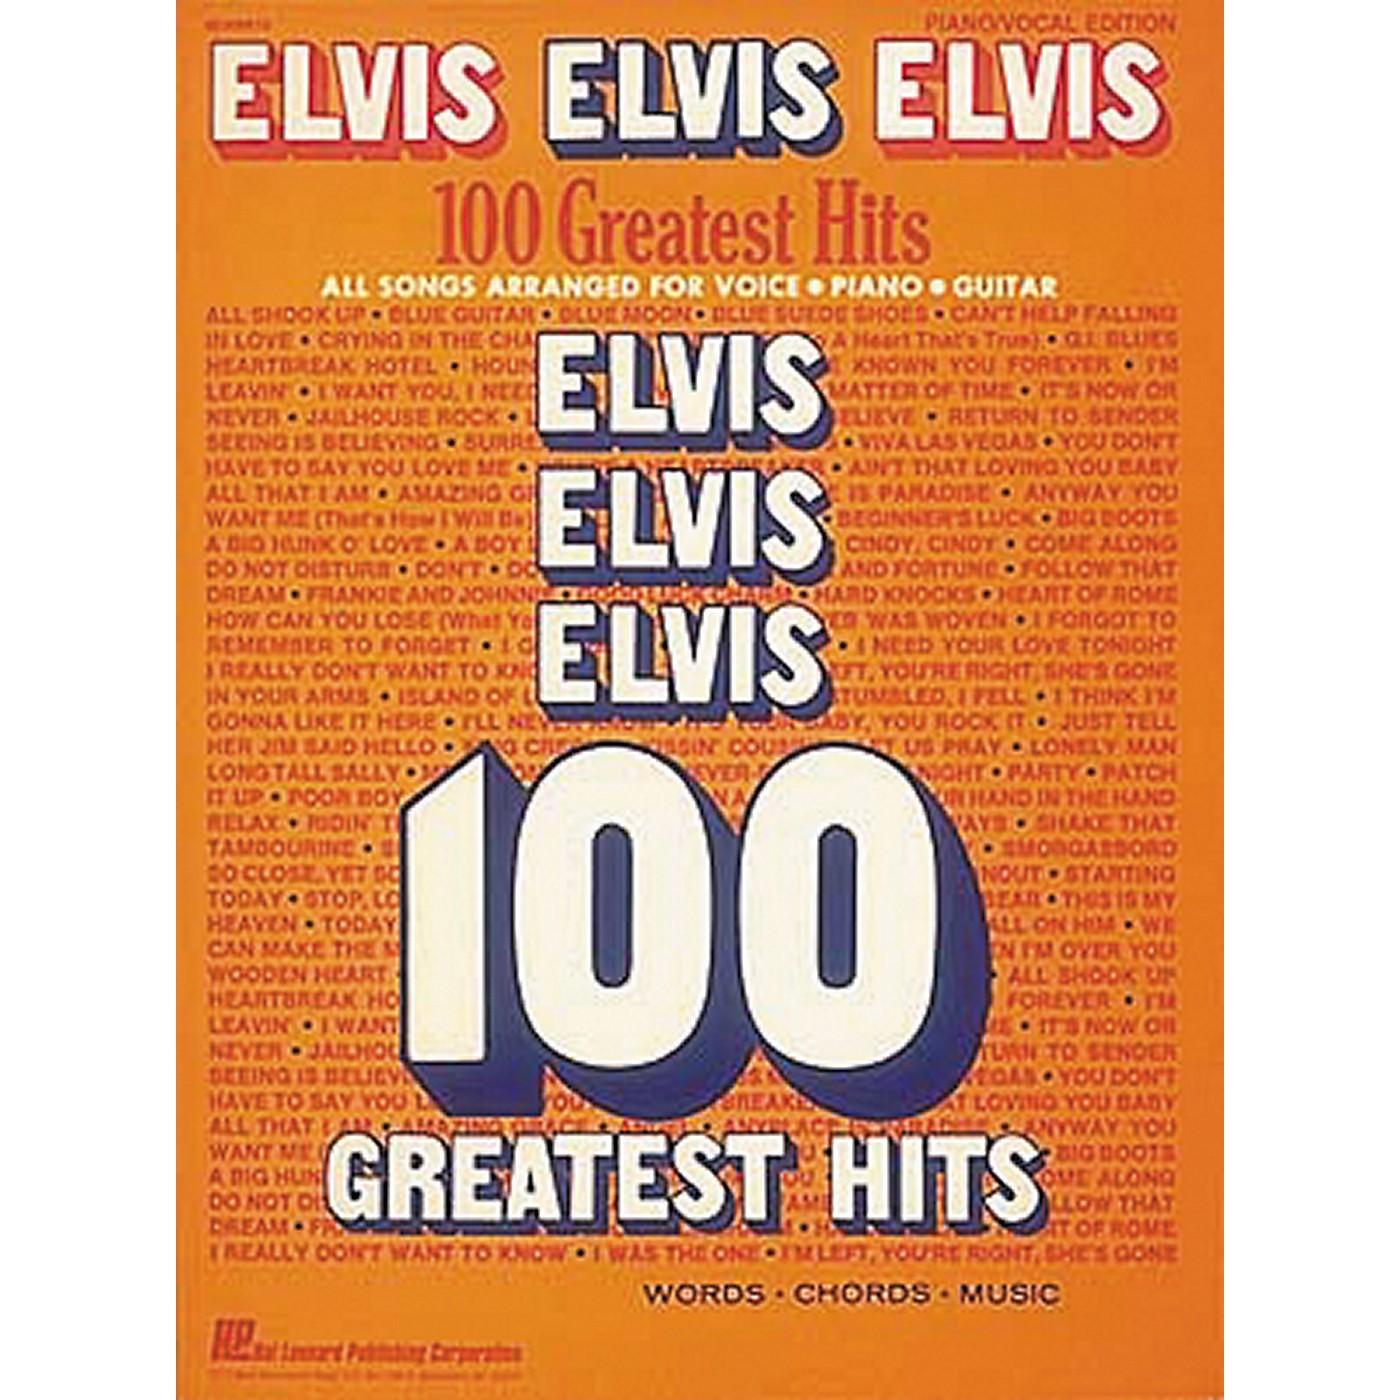 Hal Leonard Elvis Elvis Elvis 100 Greatest Hits Piano, Vocal, Guitar Songbook thumbnail